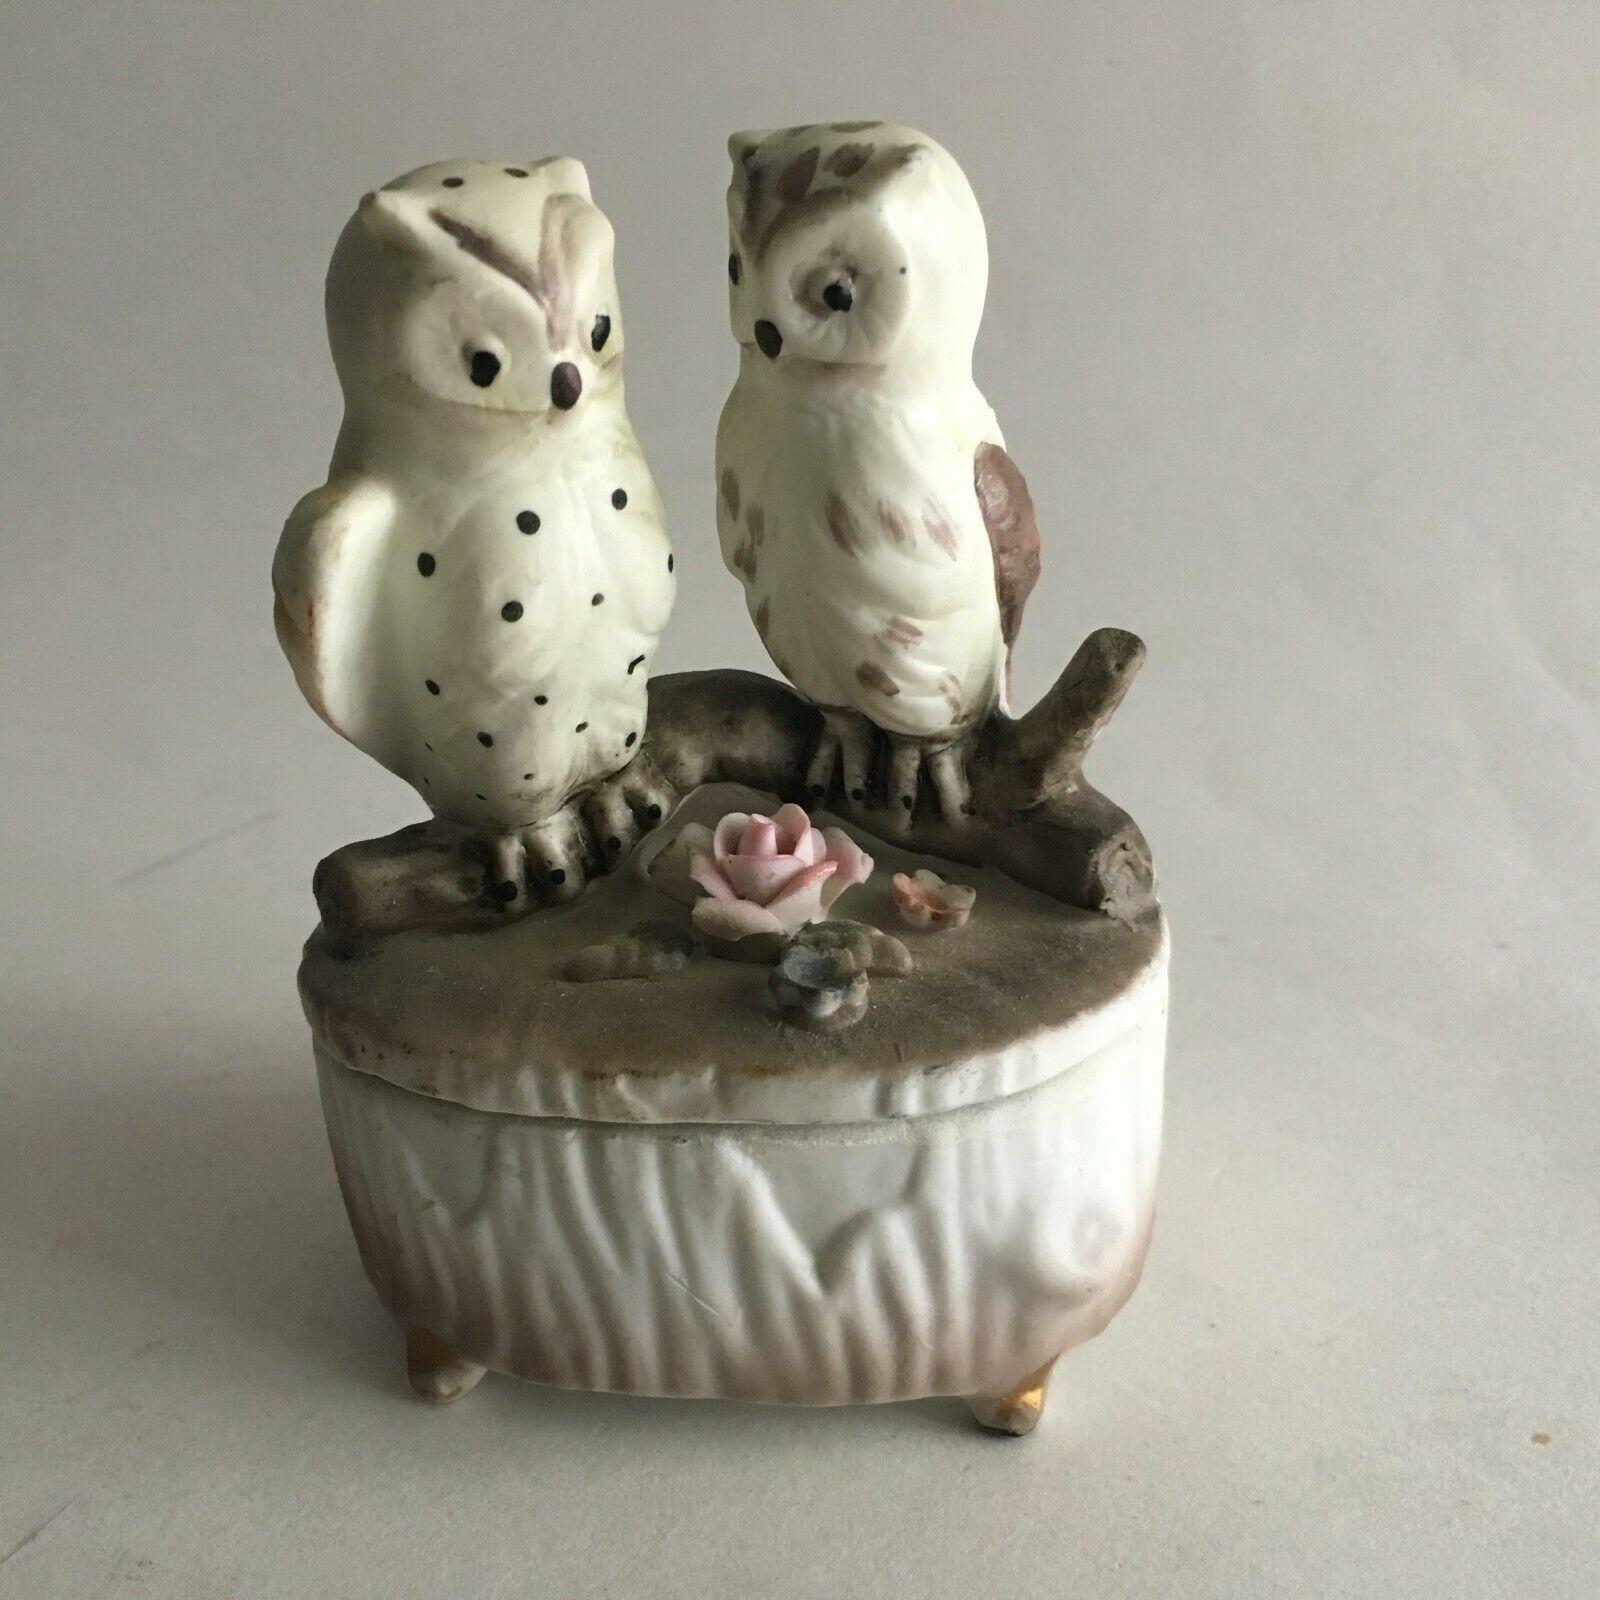 "Vintage Owl Ceramic Figurine Statue Trinket Box w/Lid 4X3X2"" Mid Century"